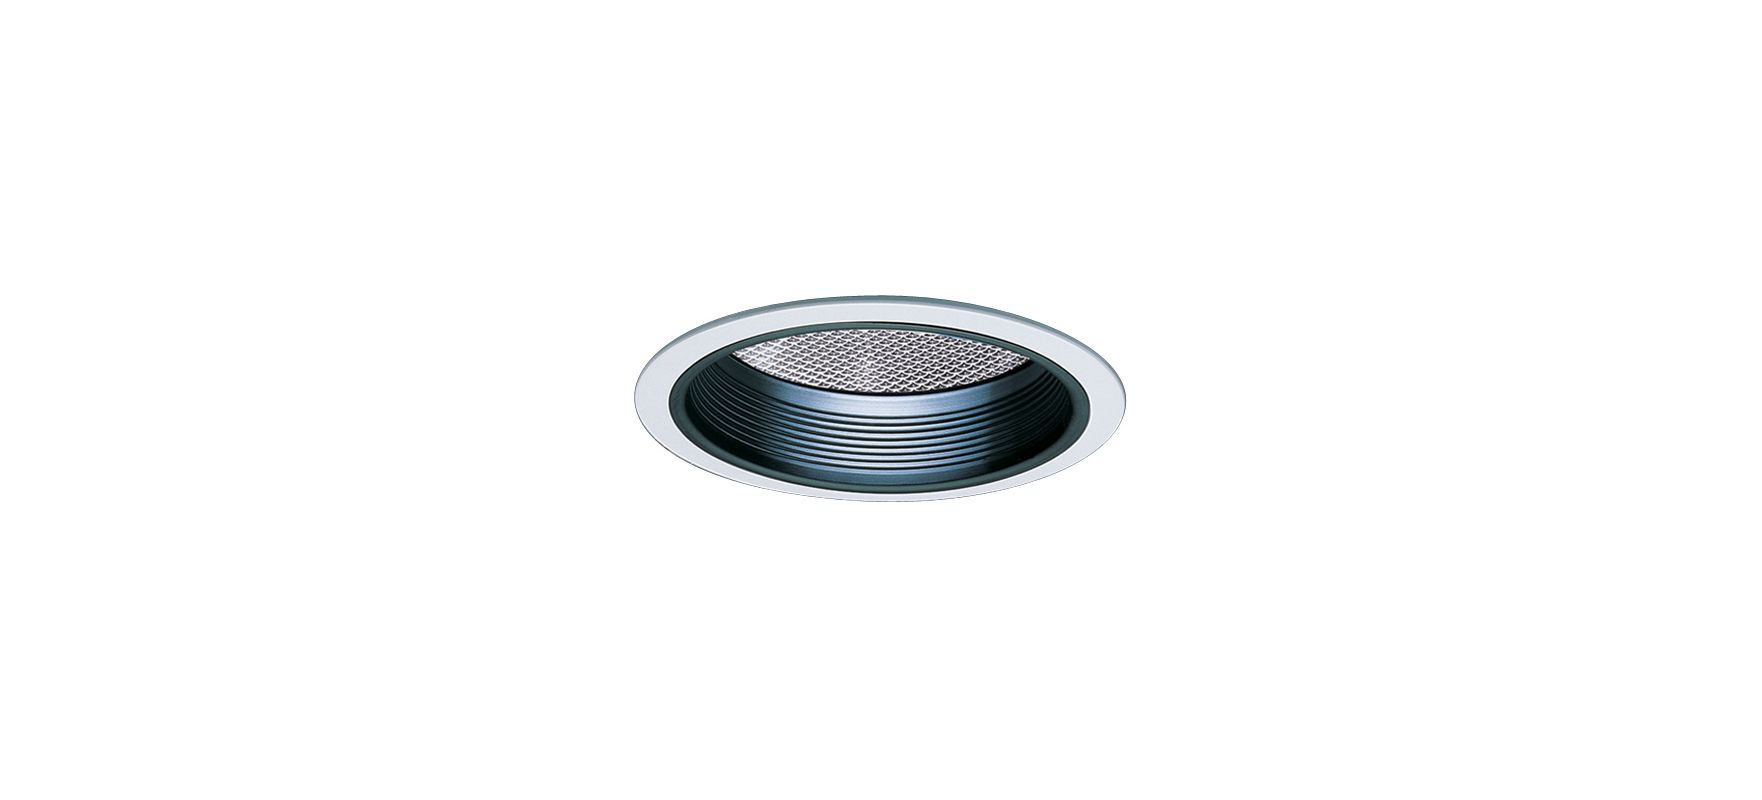 "Elco EL843 8"" CFL Reflector with Regressed Prismatic Lens and Baffle"